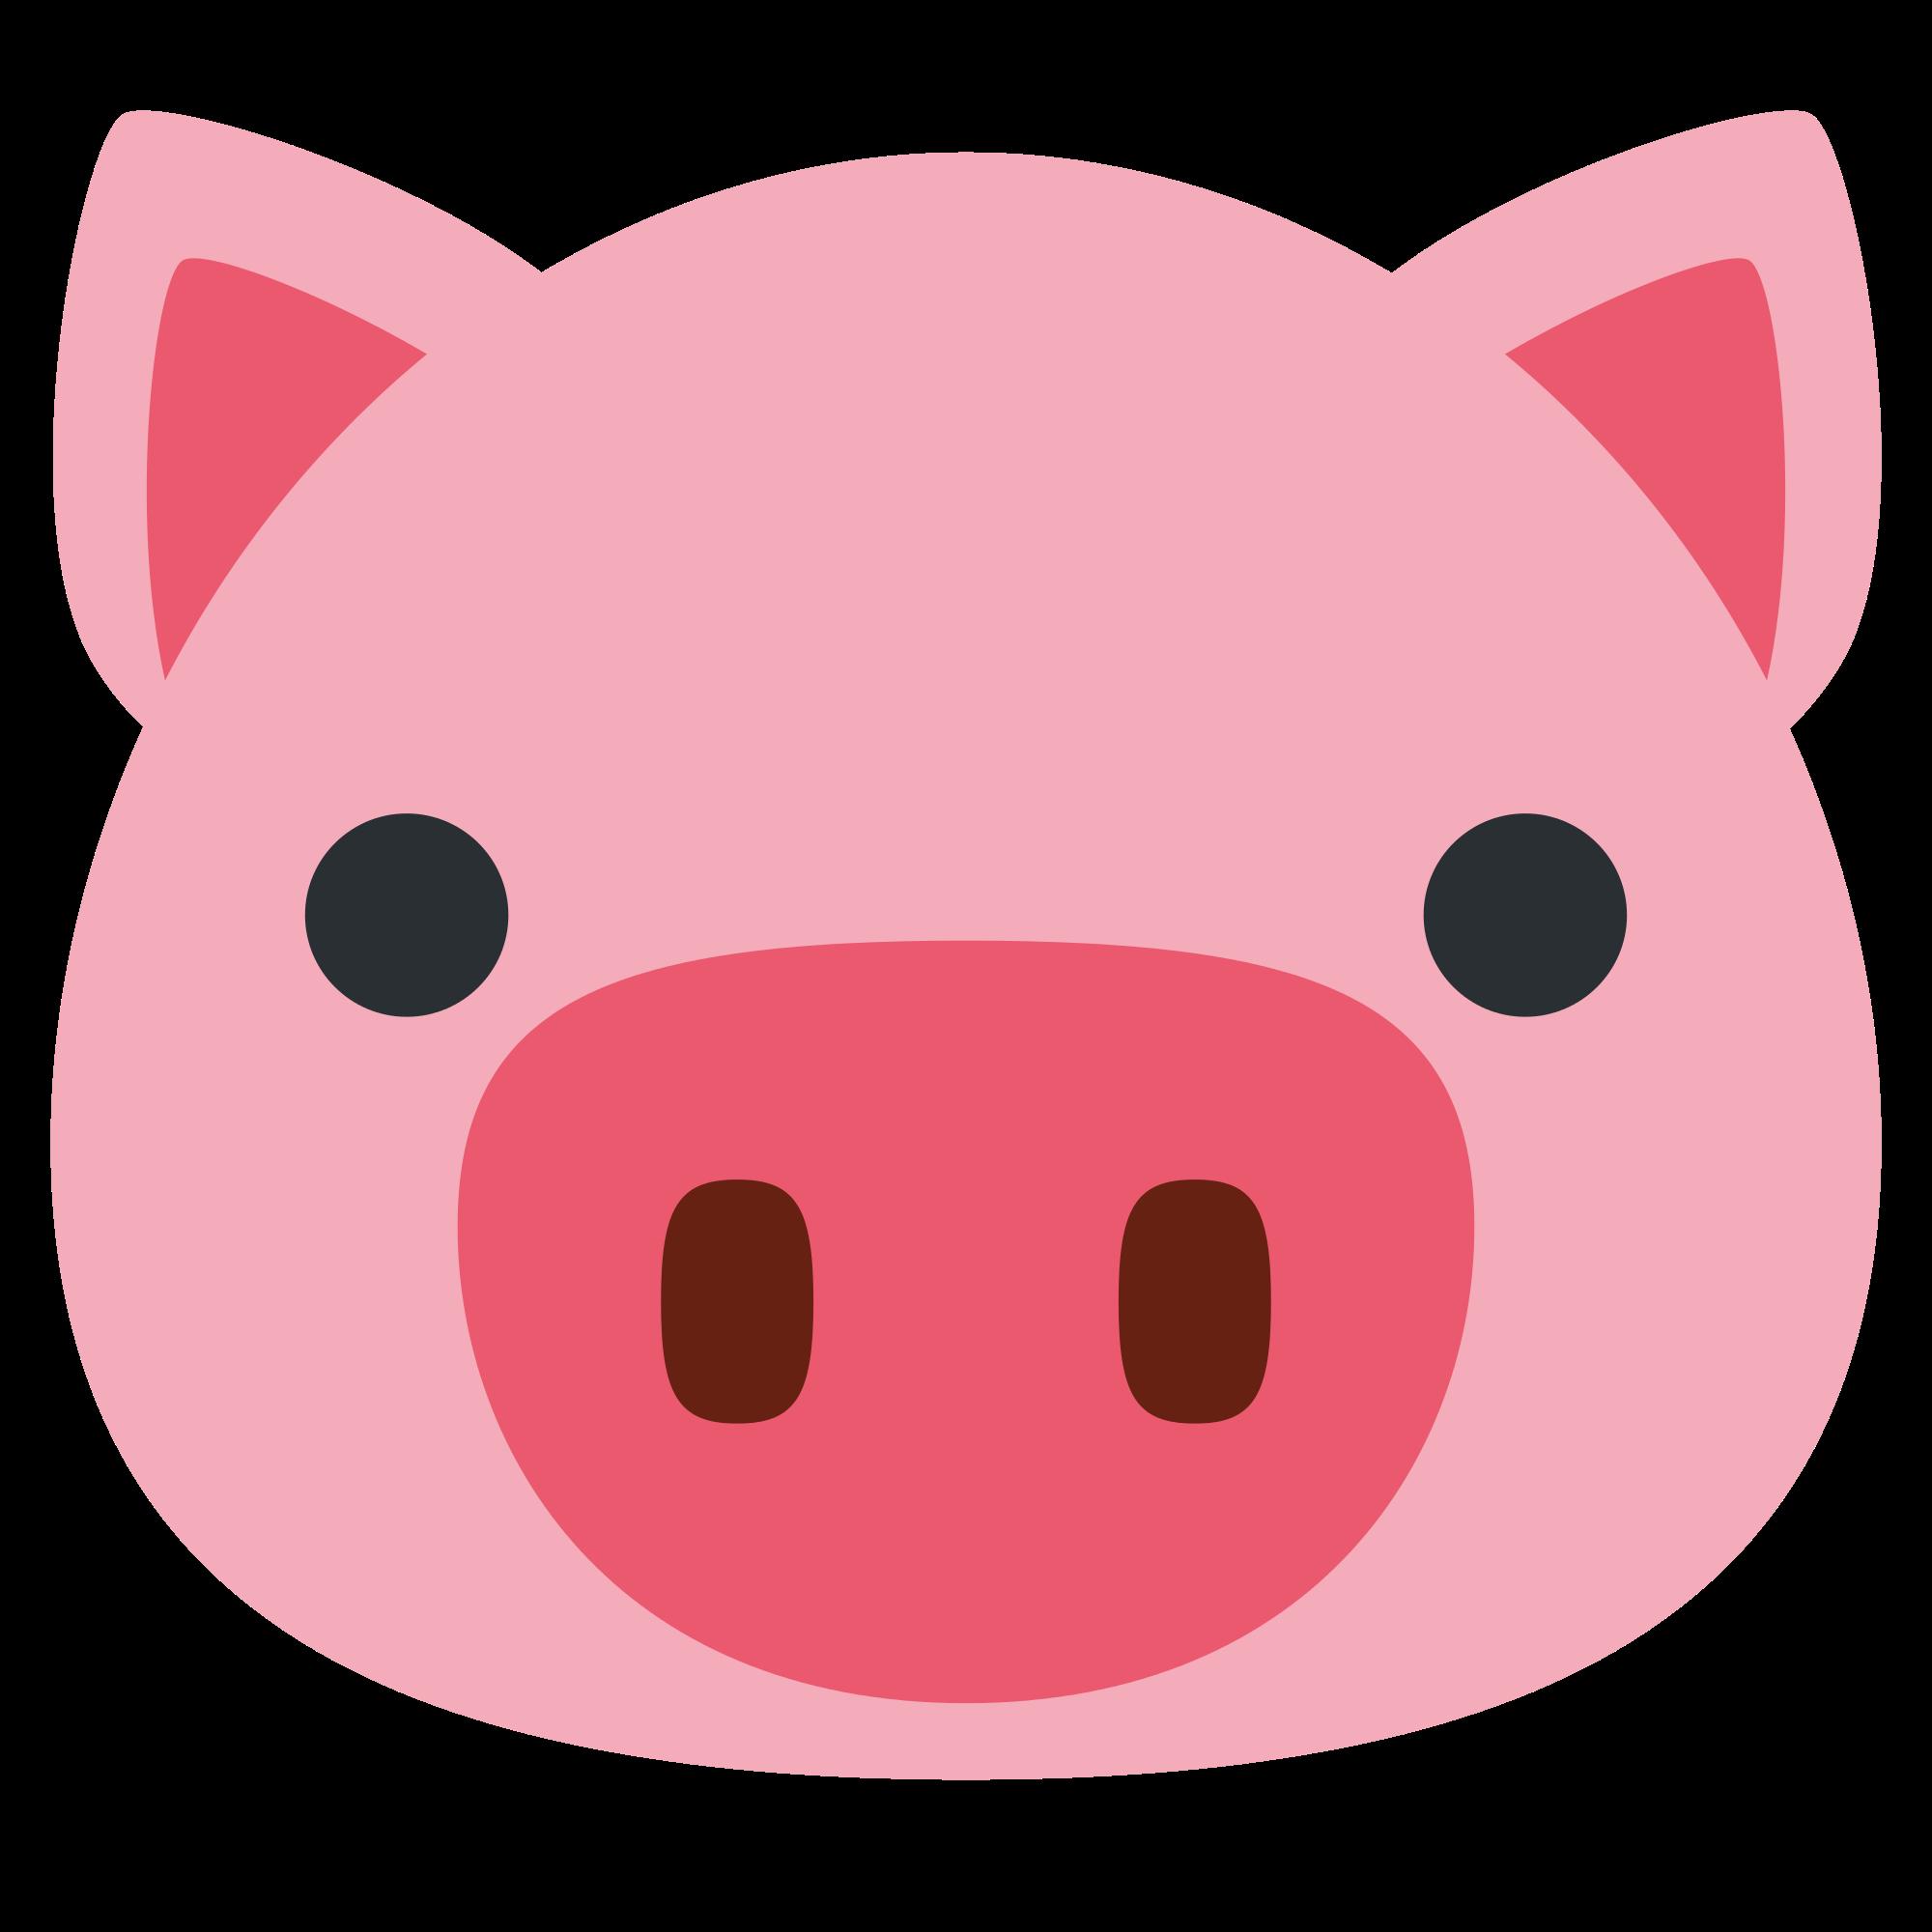 Pig svg #15, Download drawings